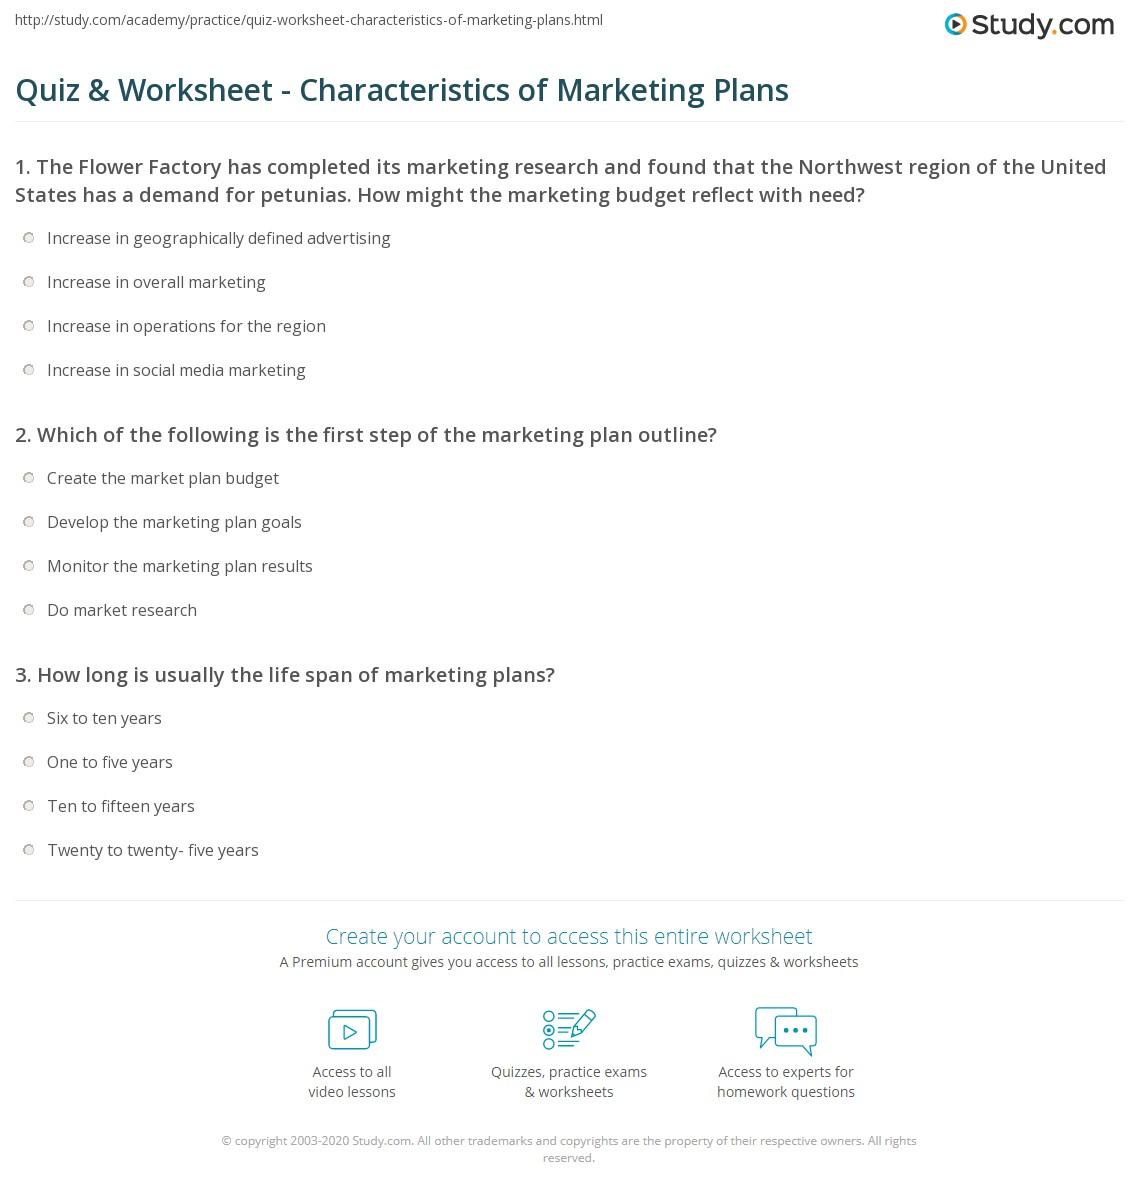 quiz & worksheet - characteristics of marketing plans | study